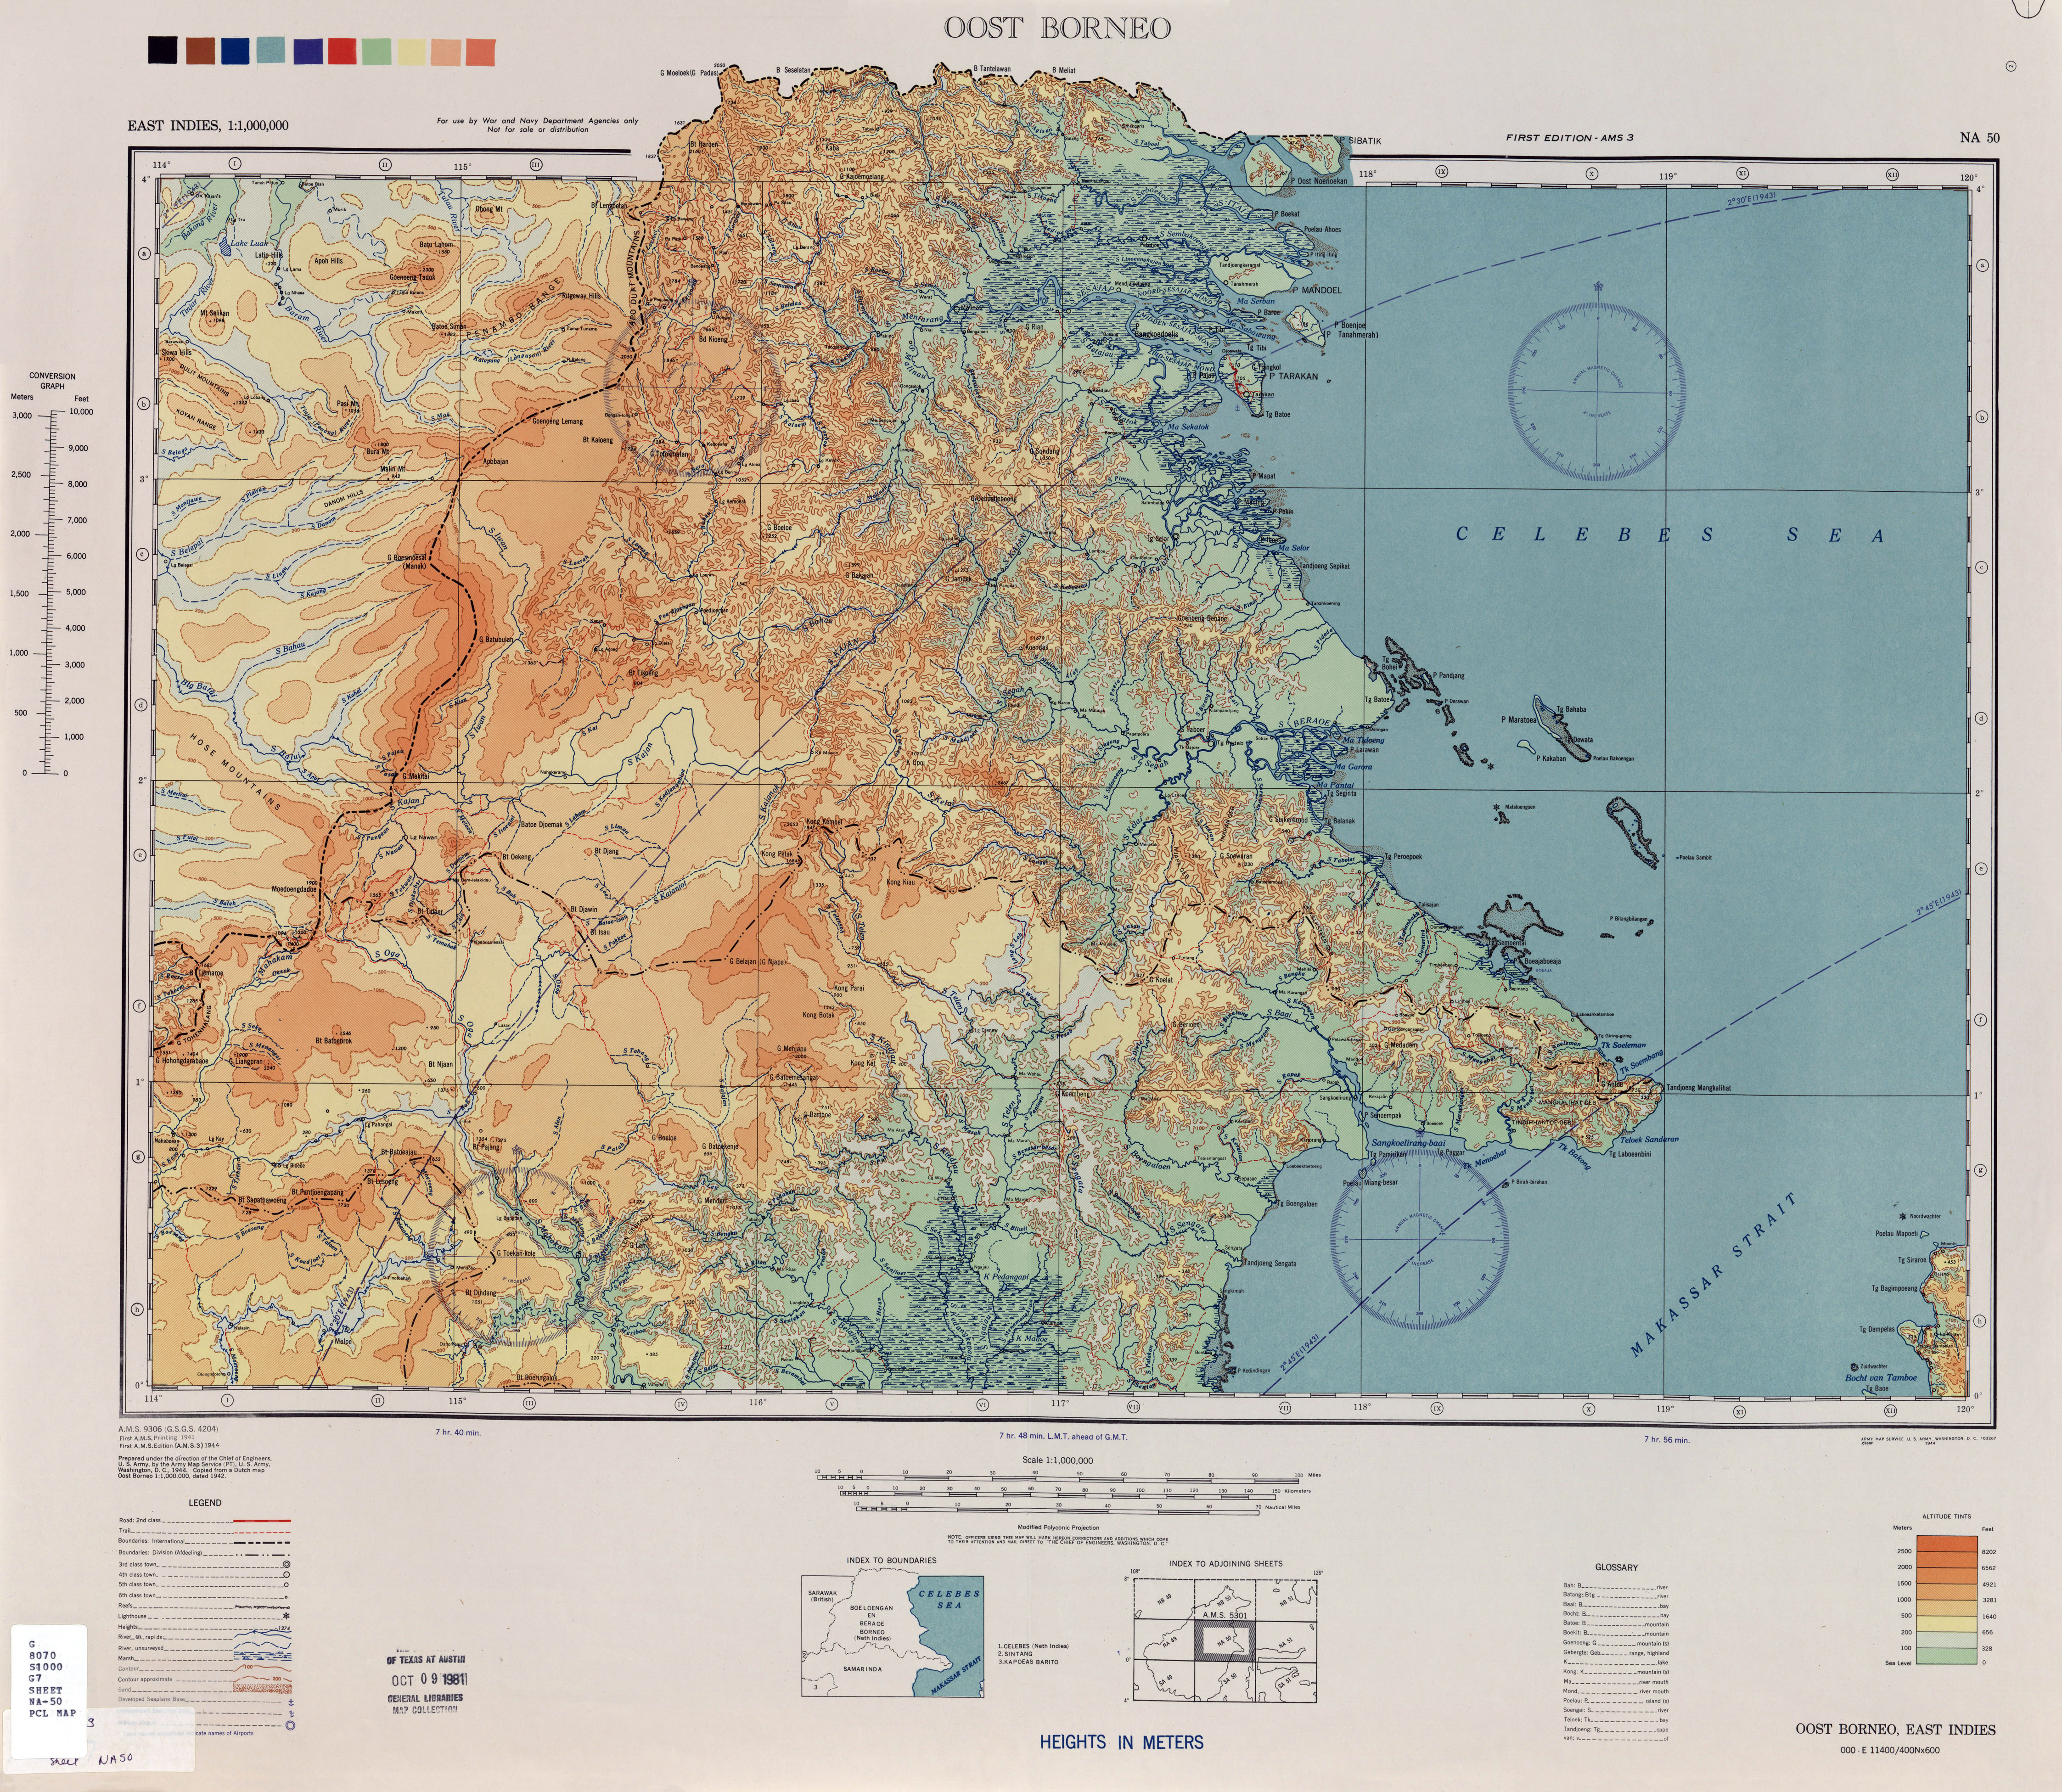 1944 Map Of South East Sarawak